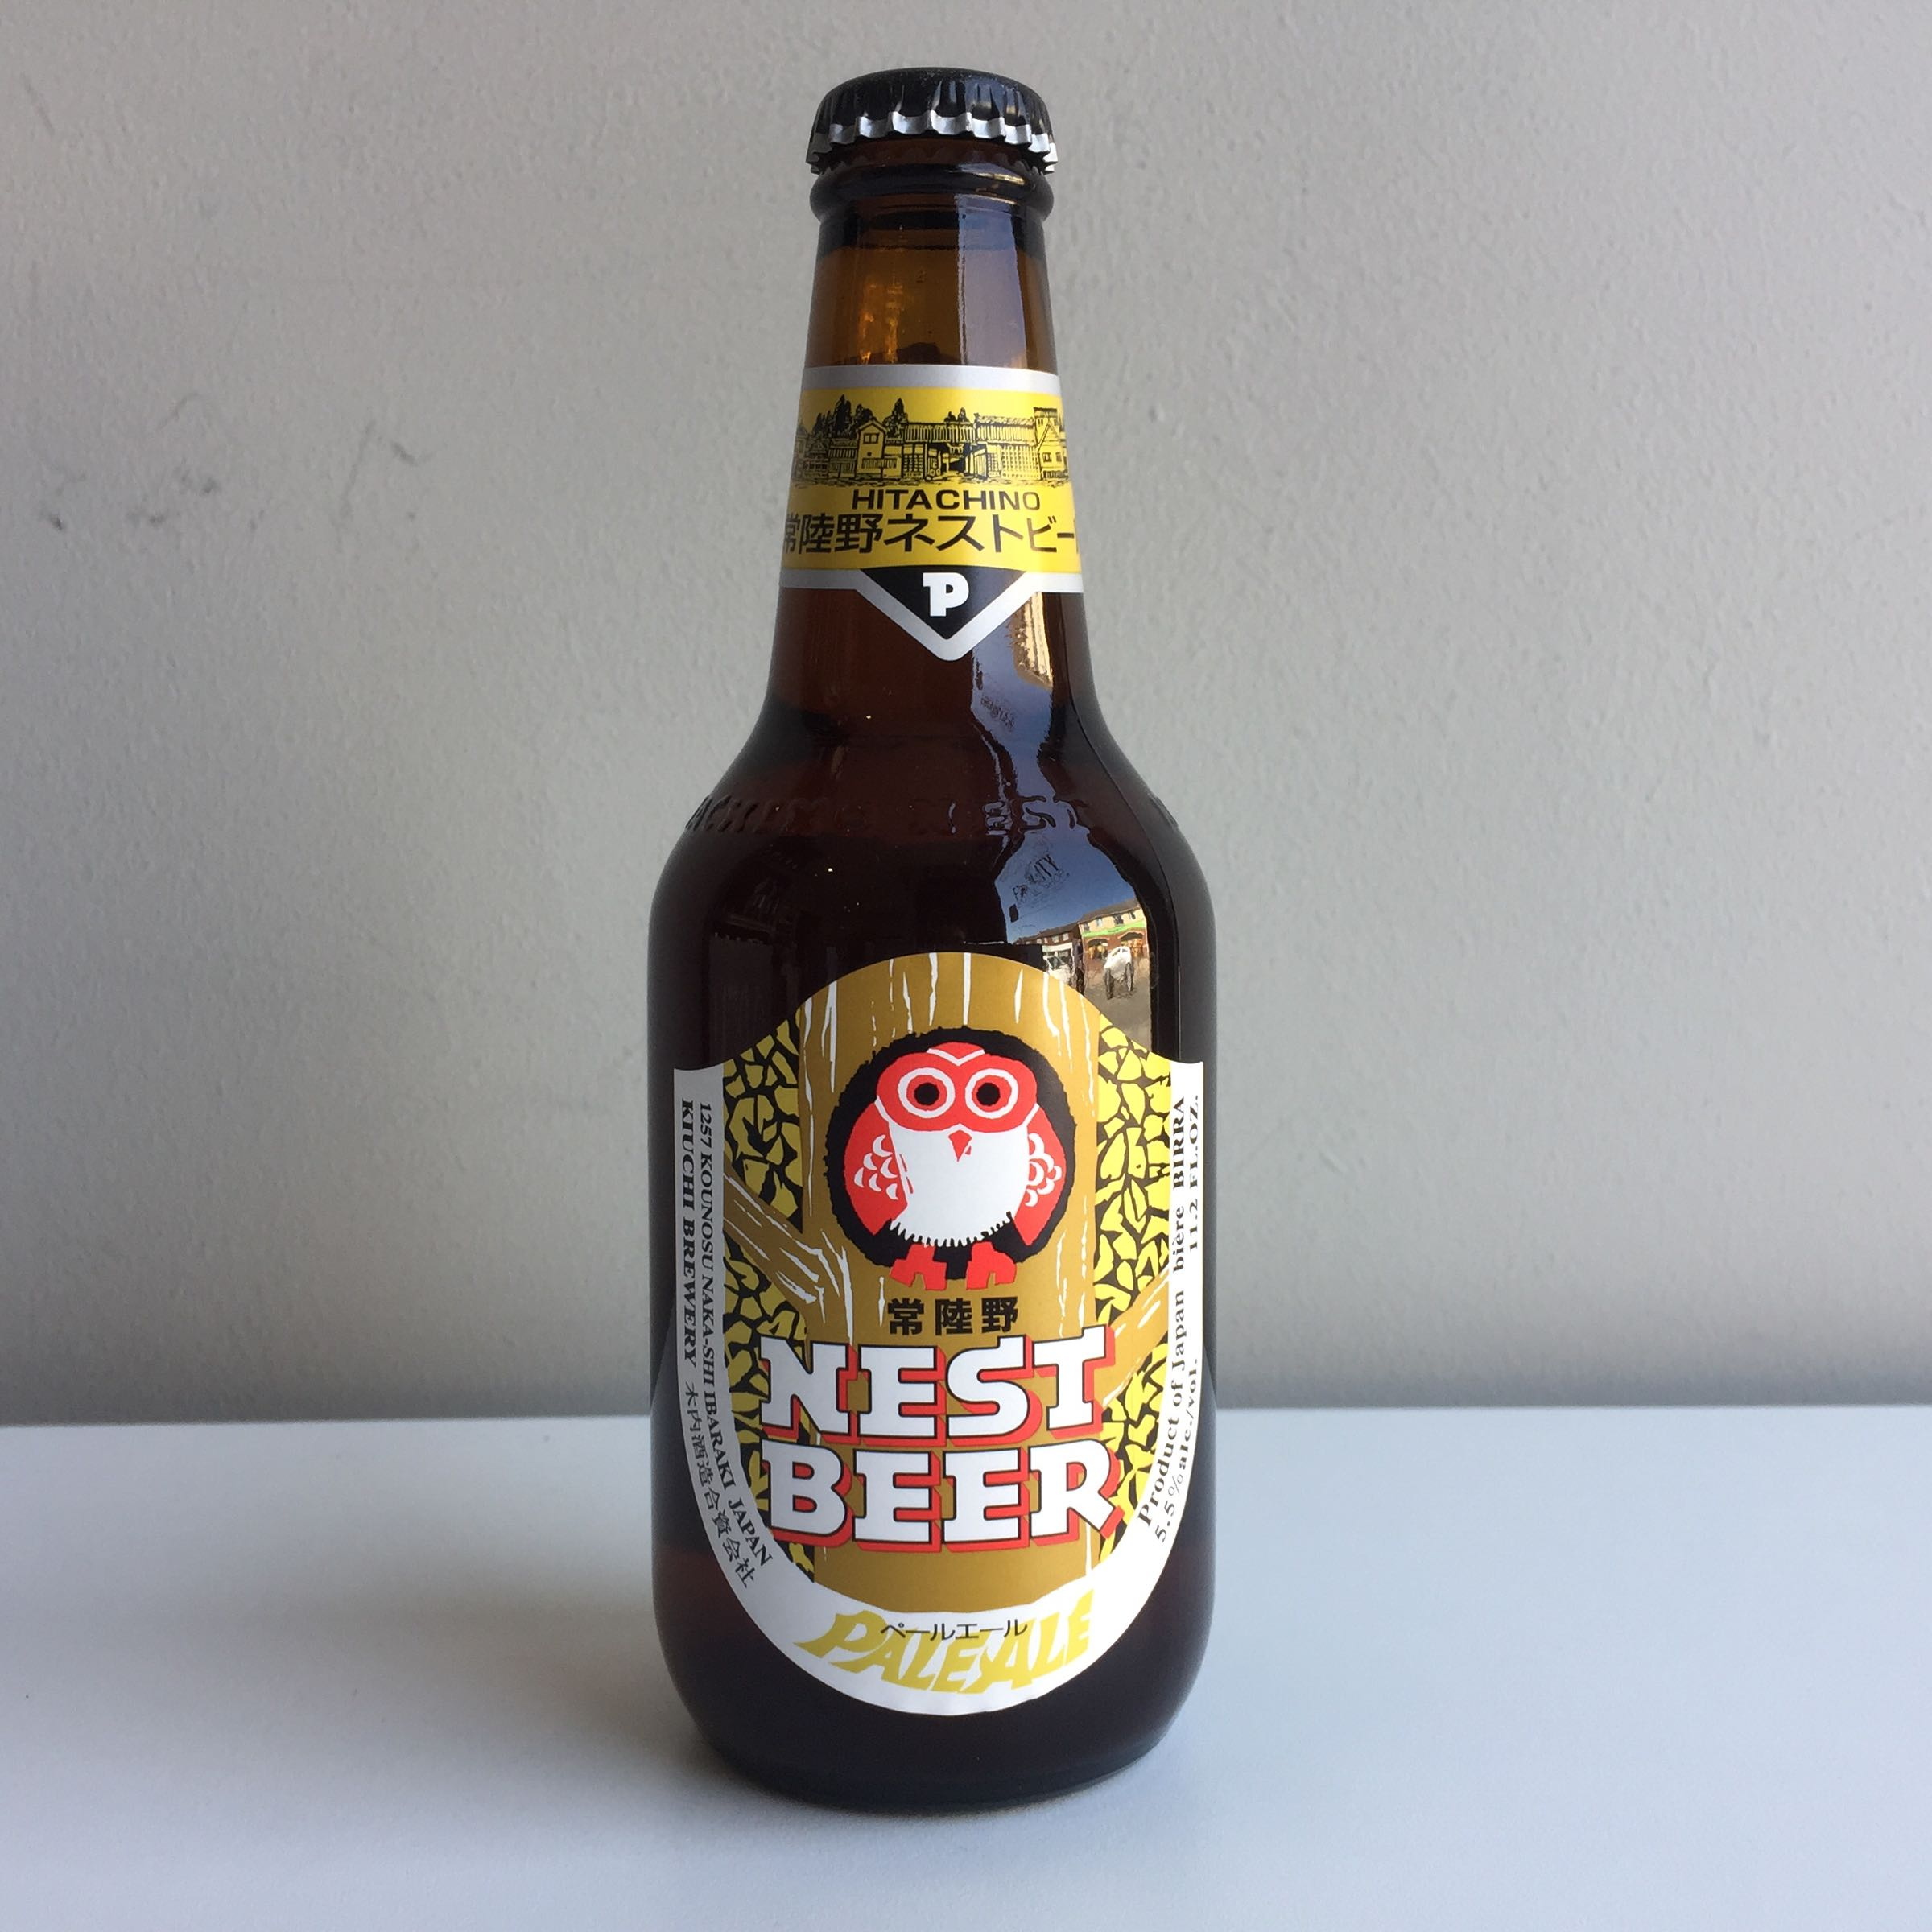 Hitachino Nest Pale Ale 330ml 5.5% ABV